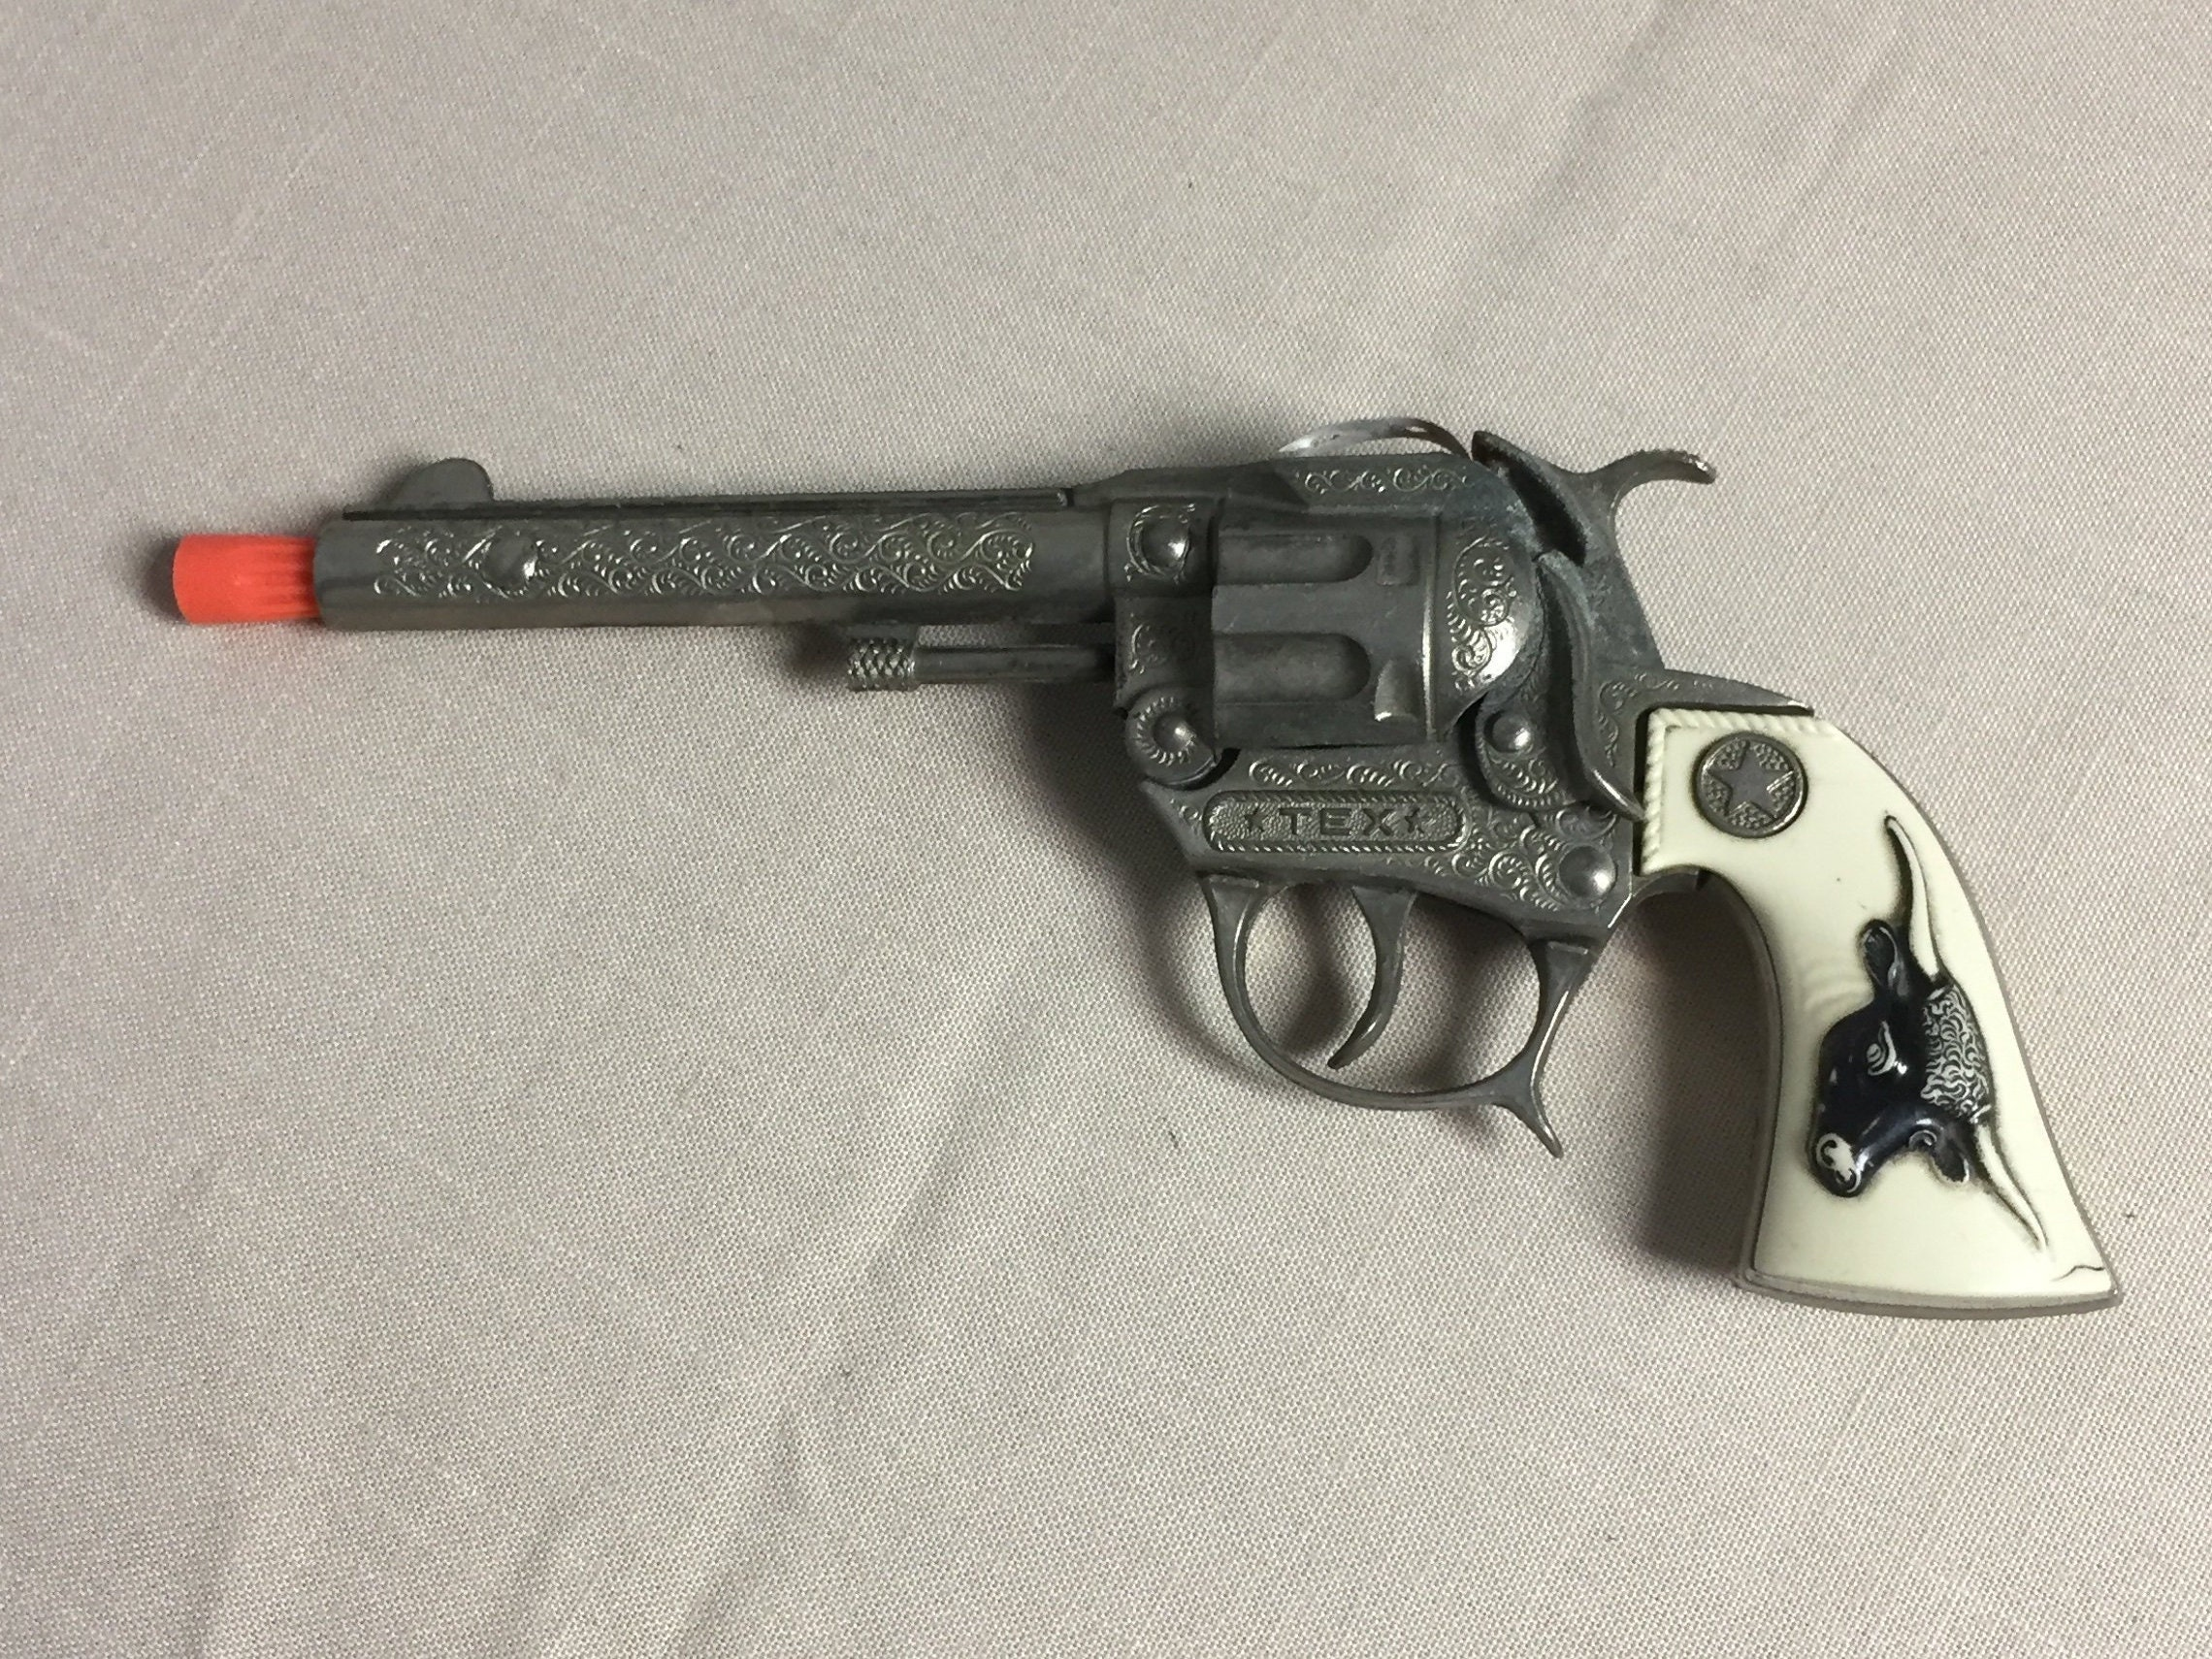 Hubley Tex Toy Cap Gun, 1950's, Toy Cowboy Gun, Cap Gun, Toy